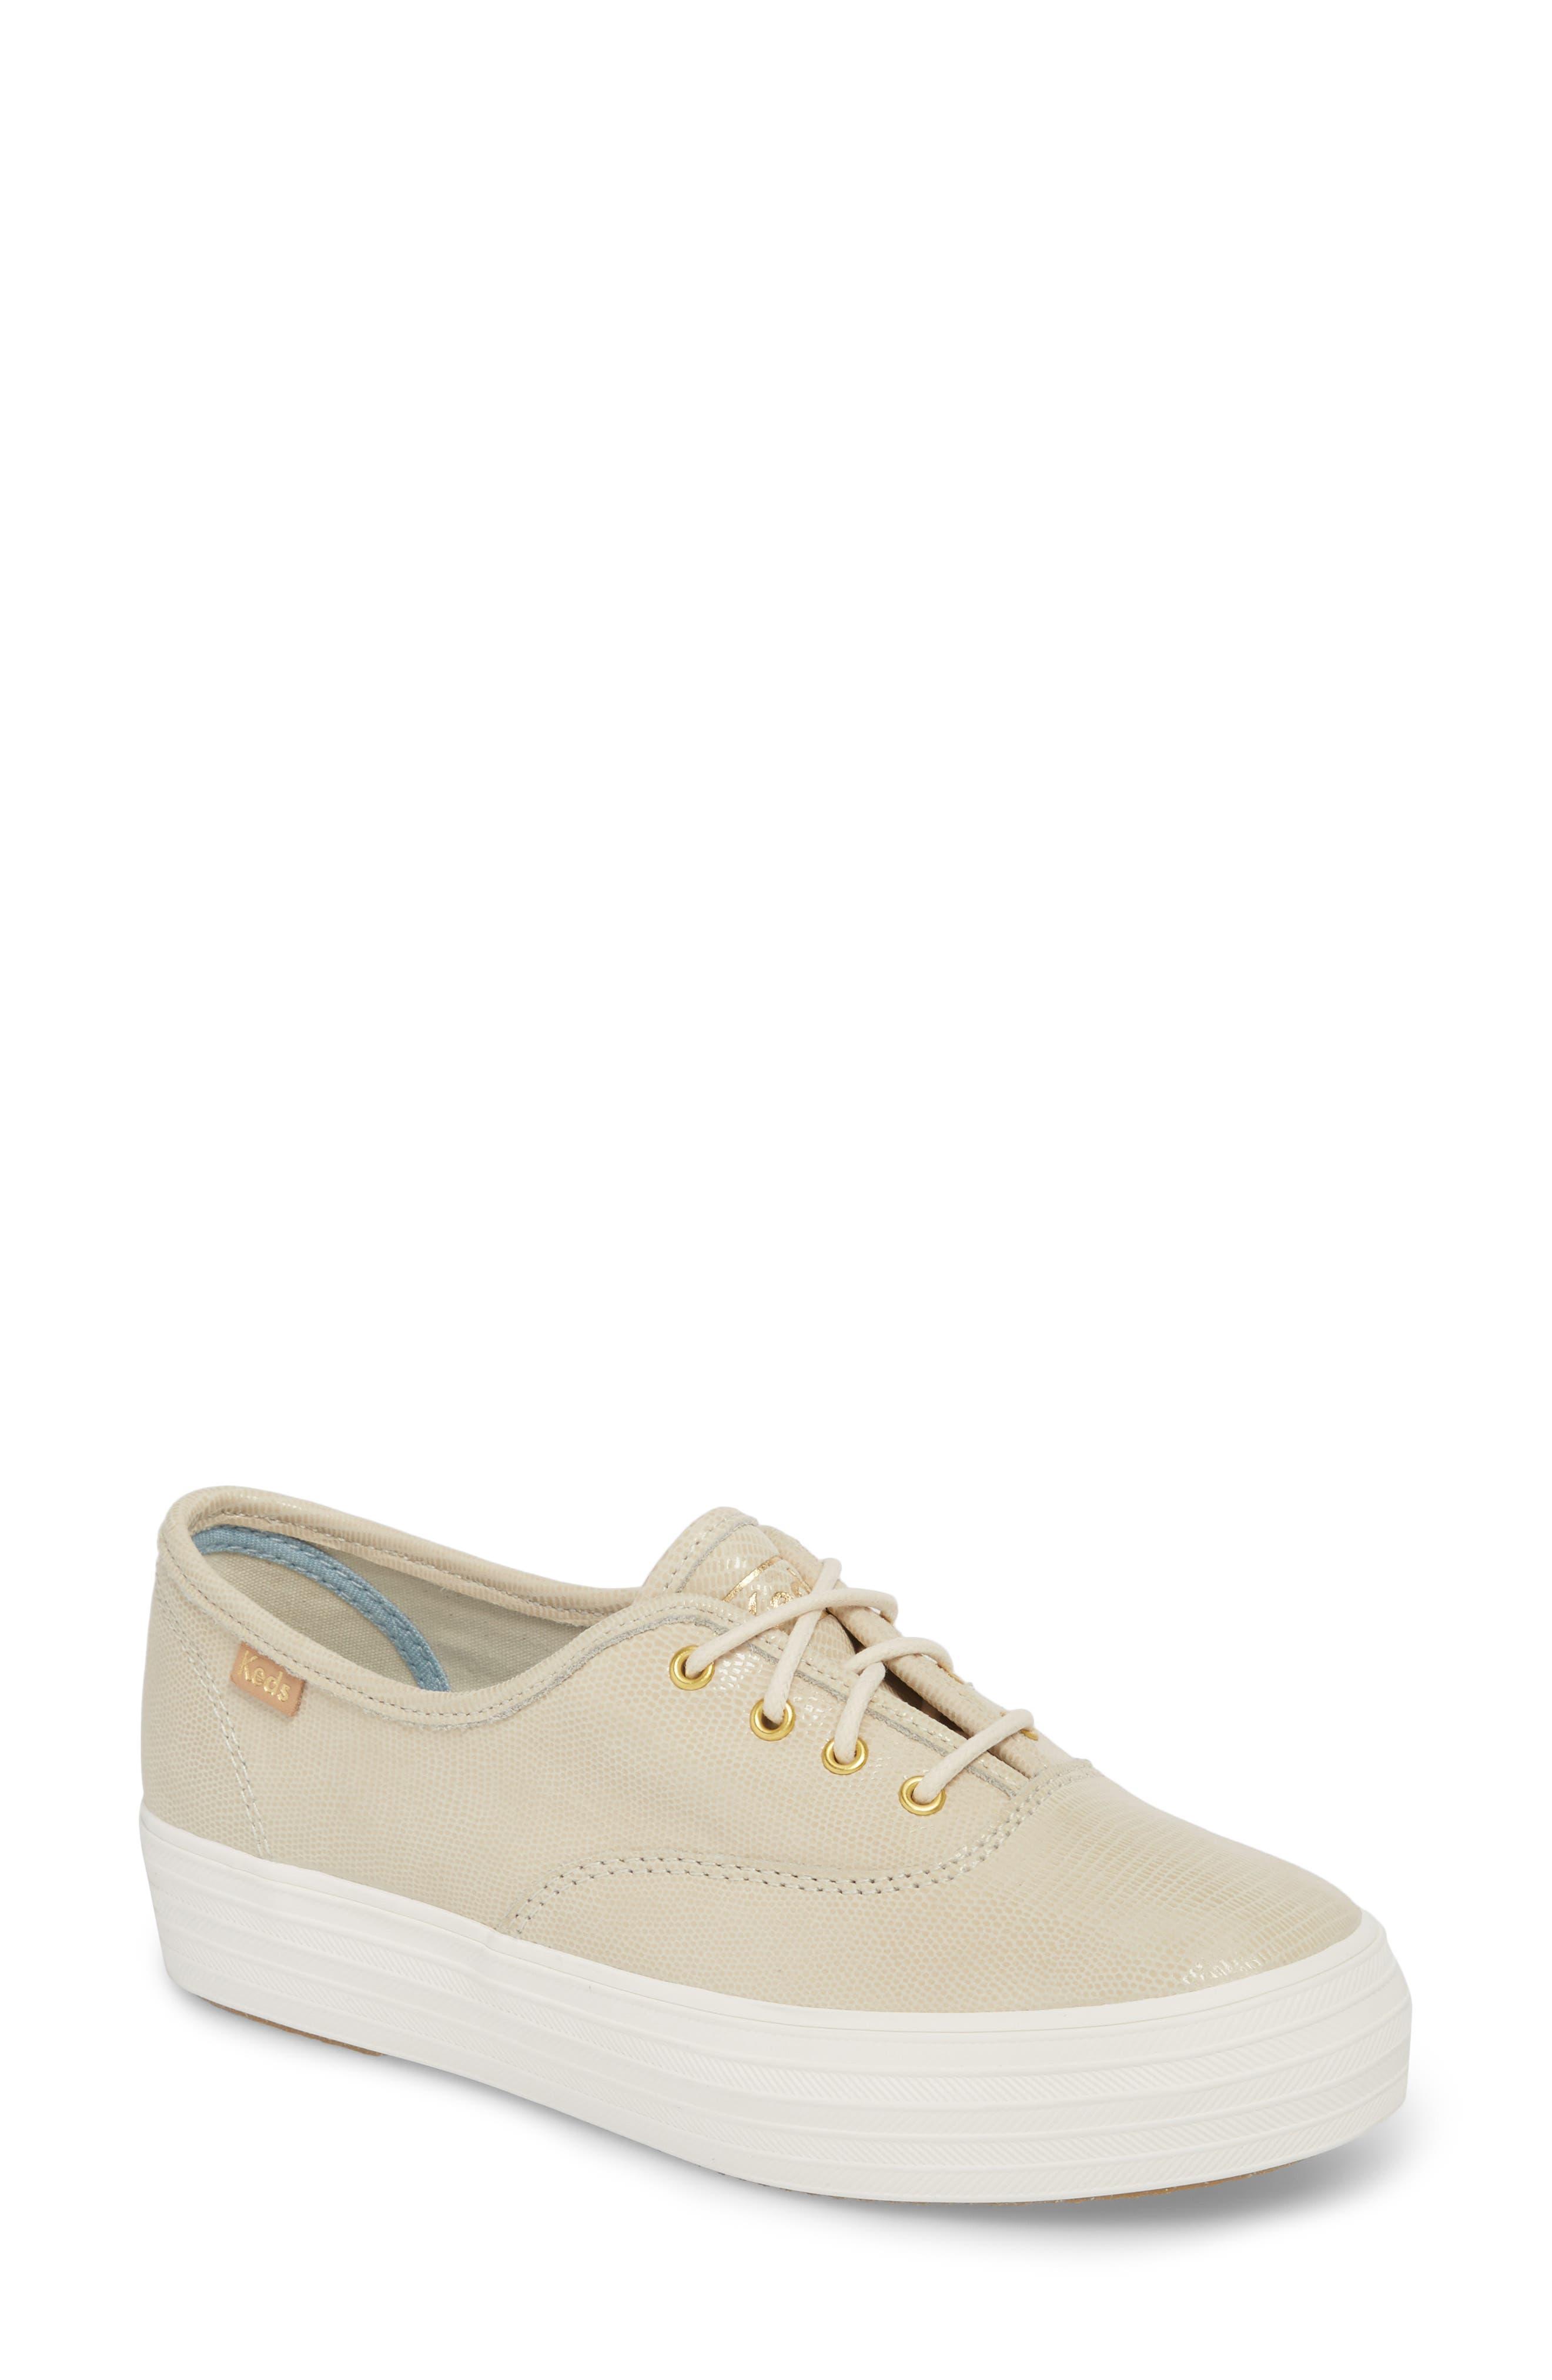 Alternate Image 1 Selected - Keds® Triple Decker Platform Sneaker (Women)